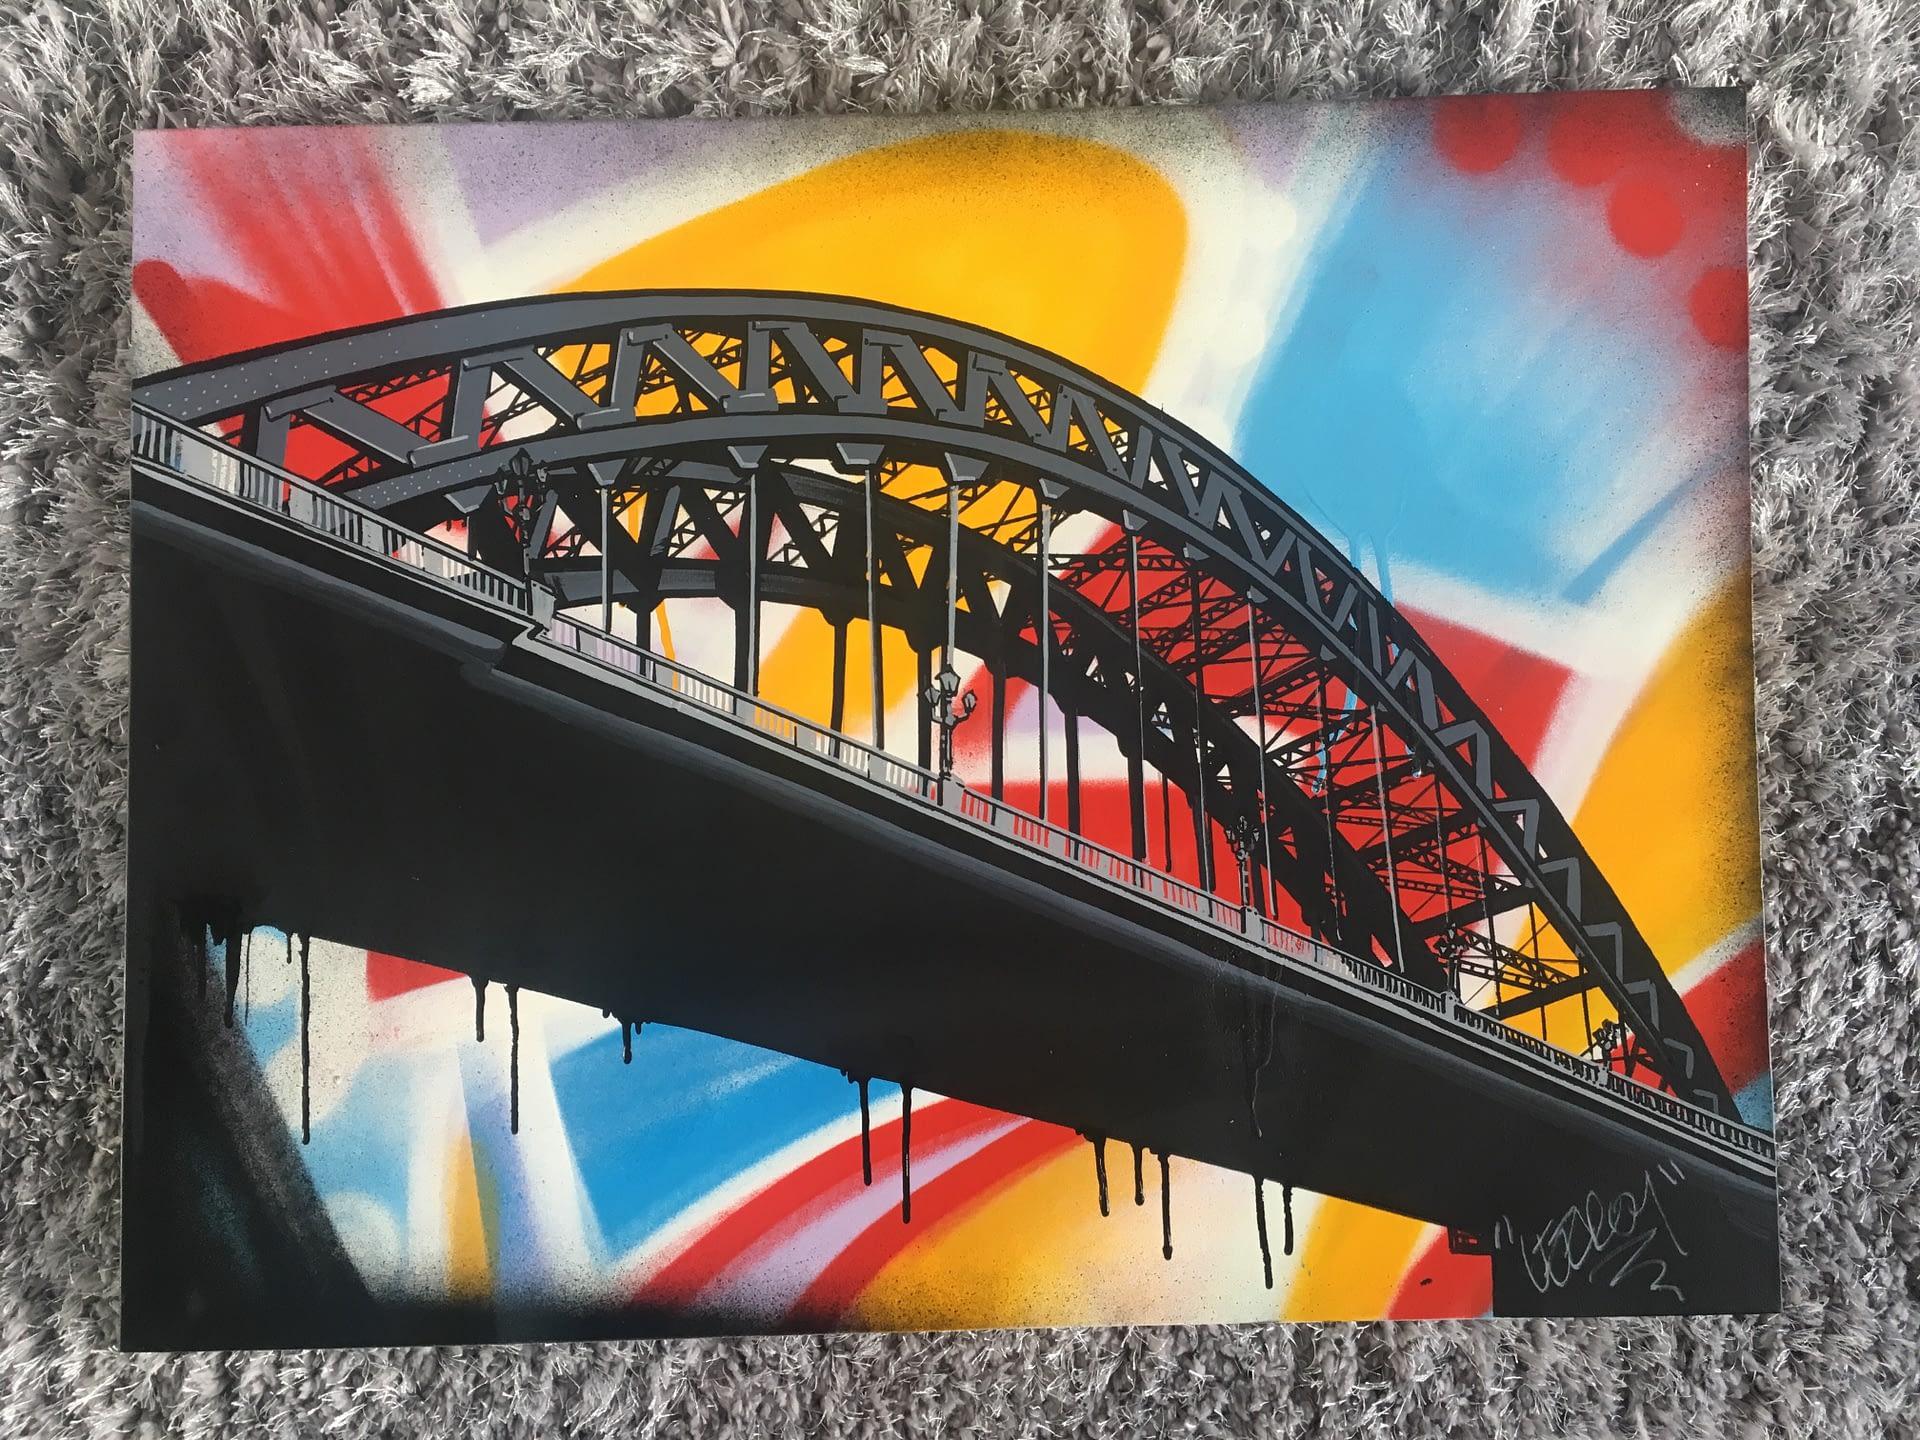 Graff on the tyne canvas 600x800